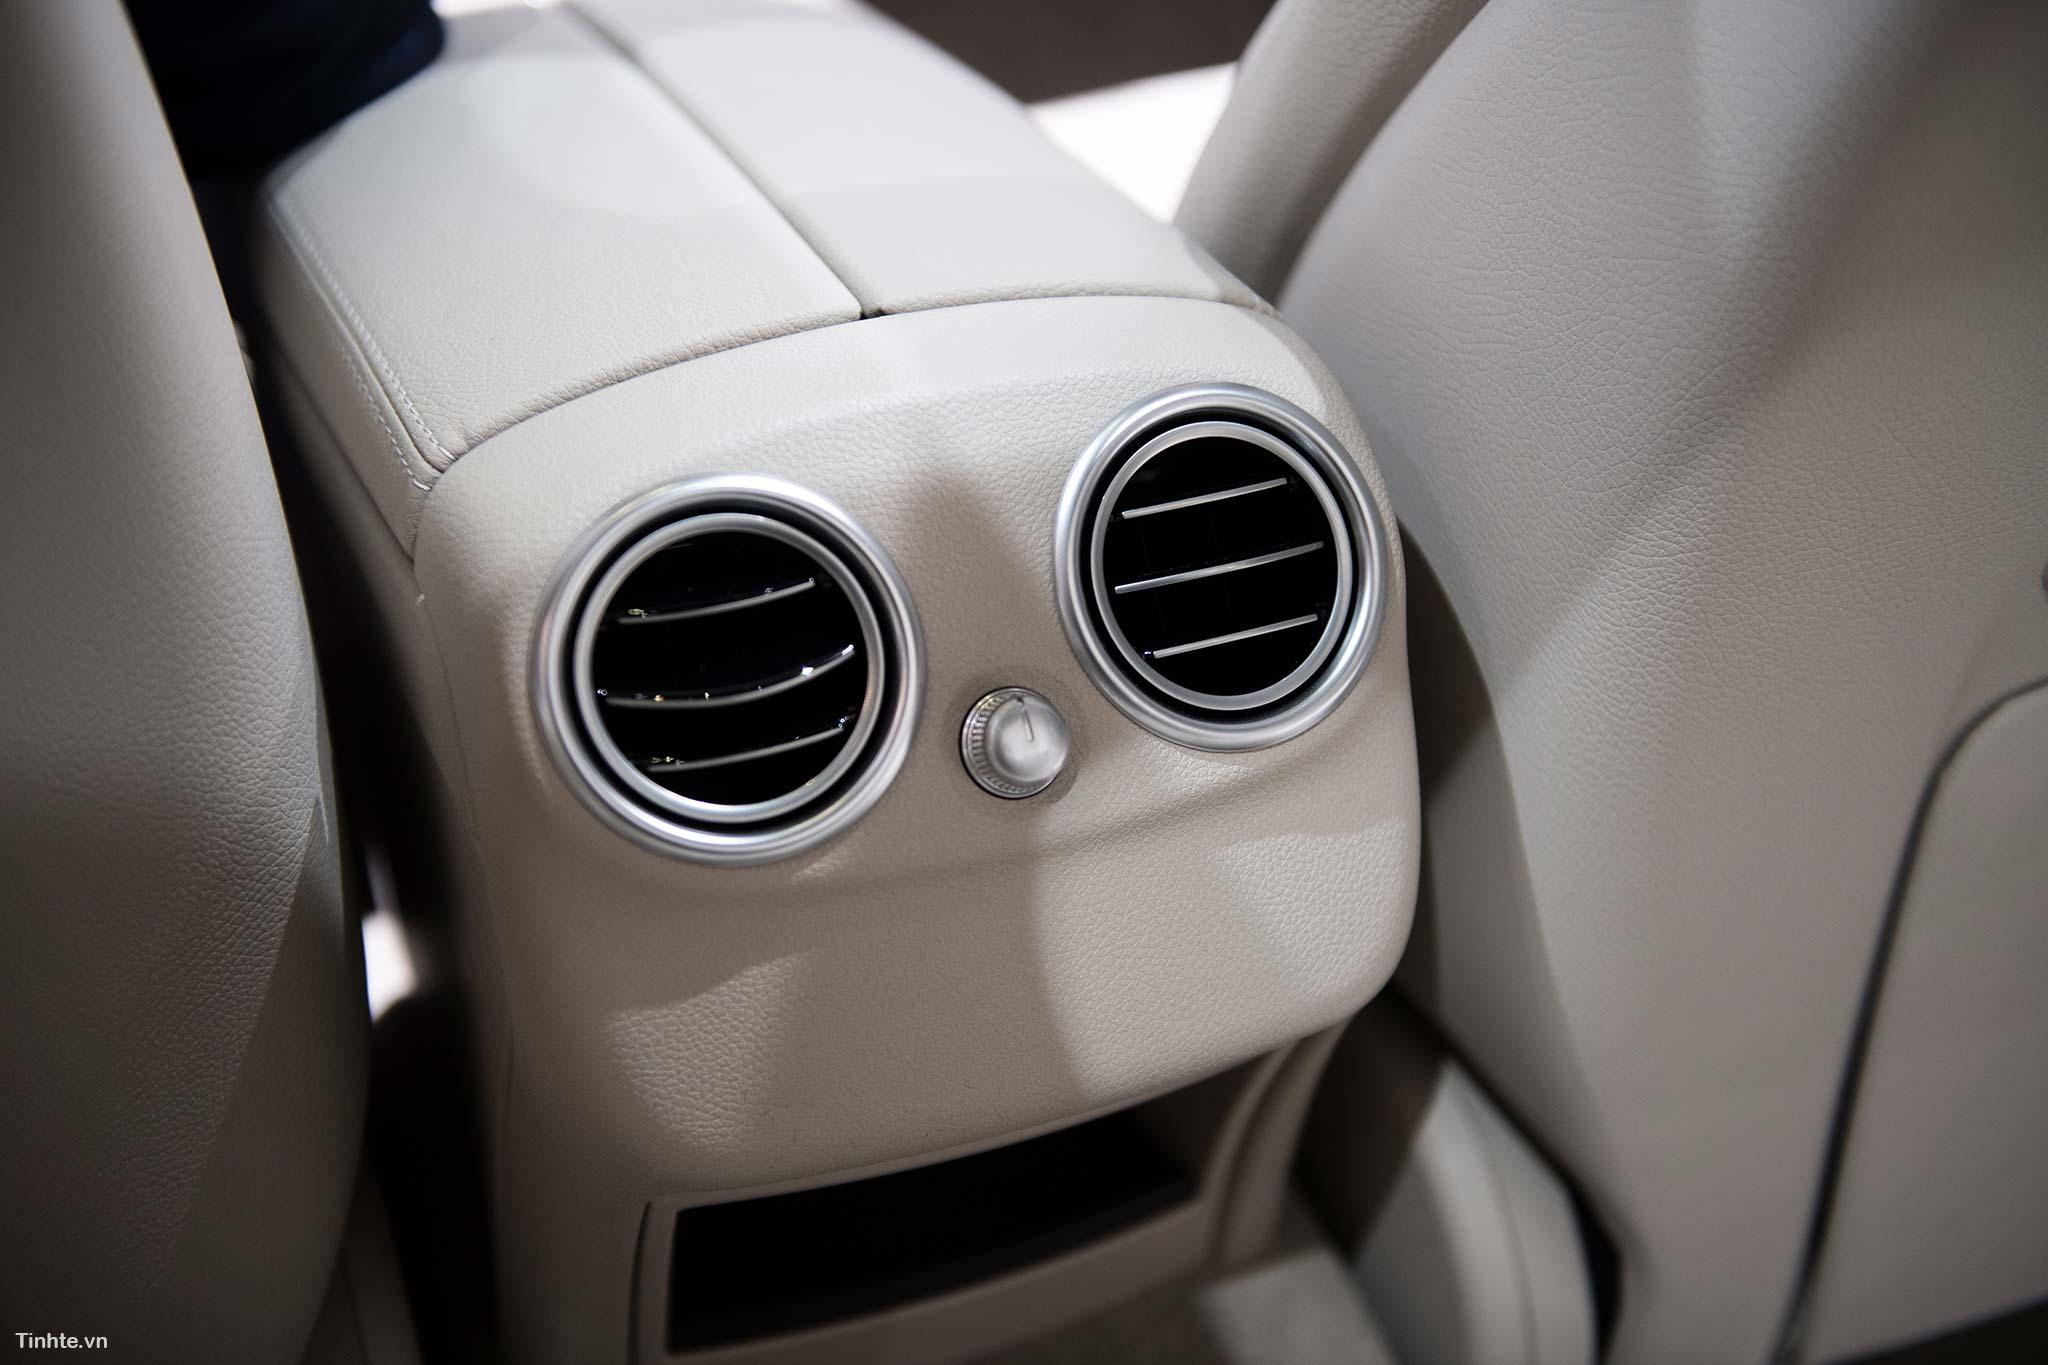 tinhte_Mercedes-Benz-C-200-4MATIC-16.jpg